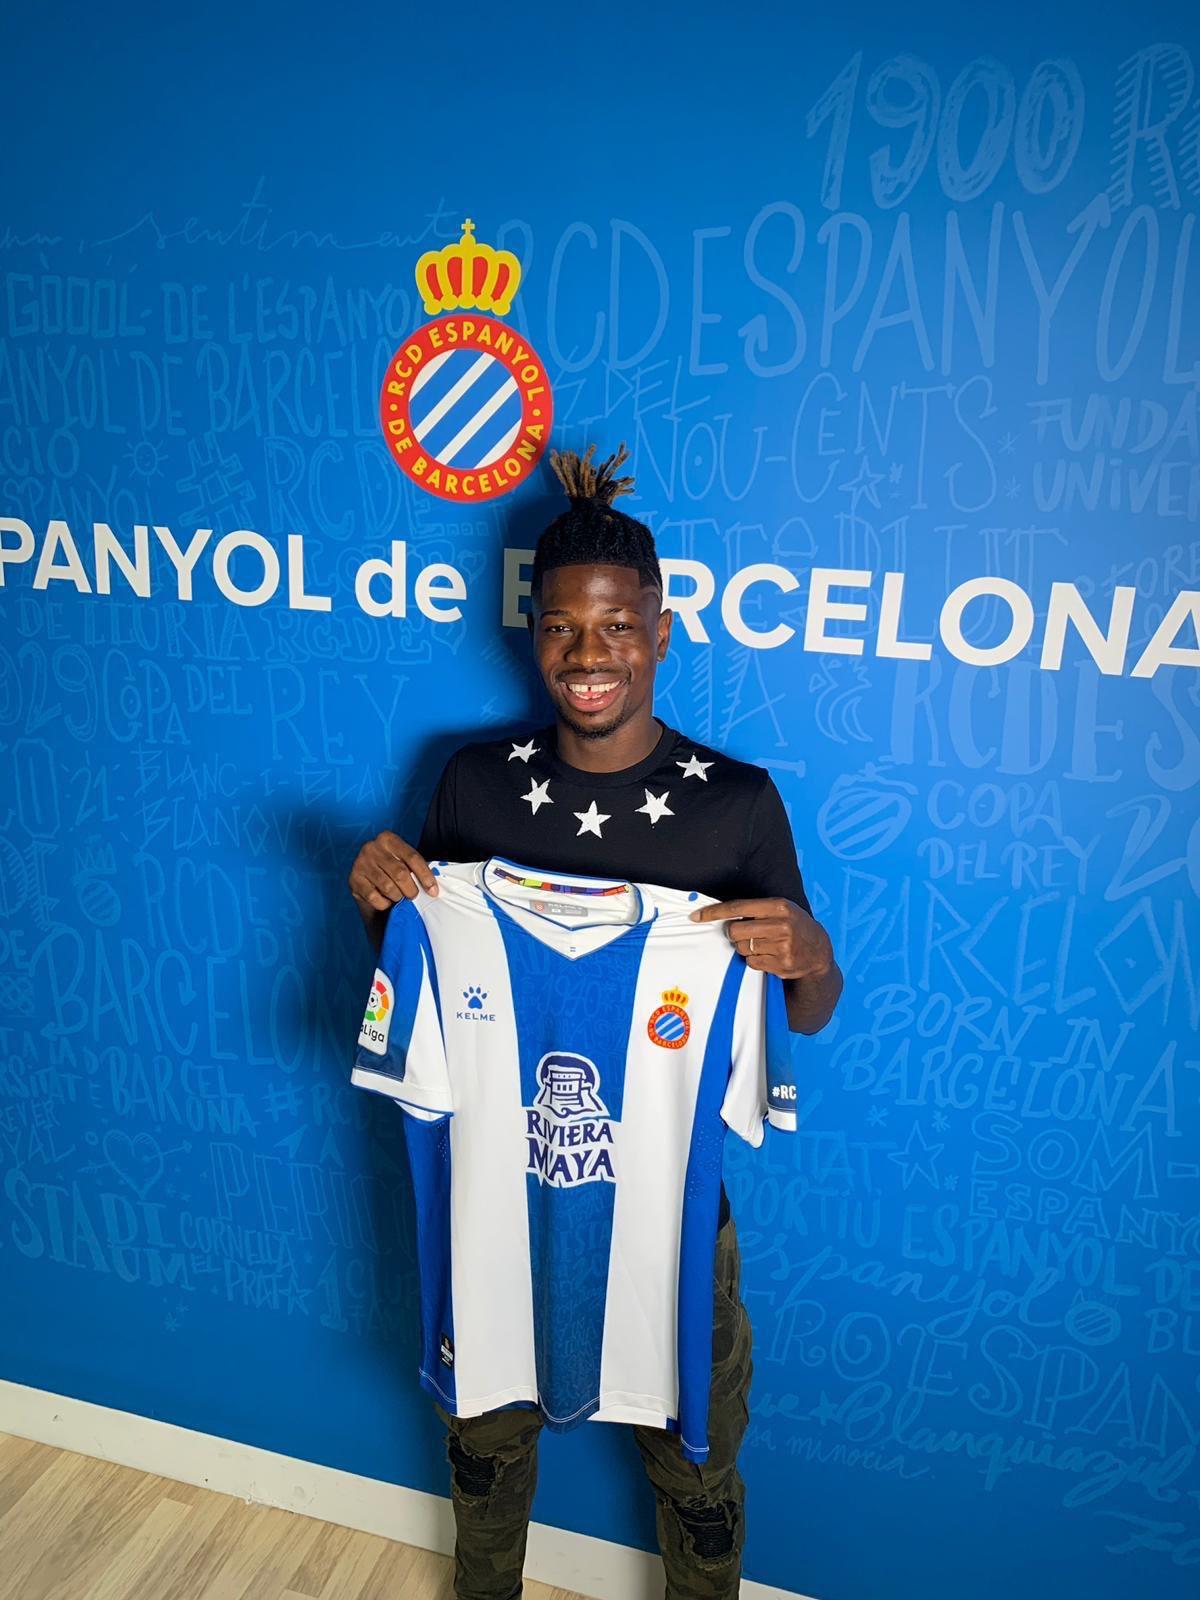 Cfa Girondins : Kévin Soni prêté à l'Espanyol Barcelone - Formation Girondins